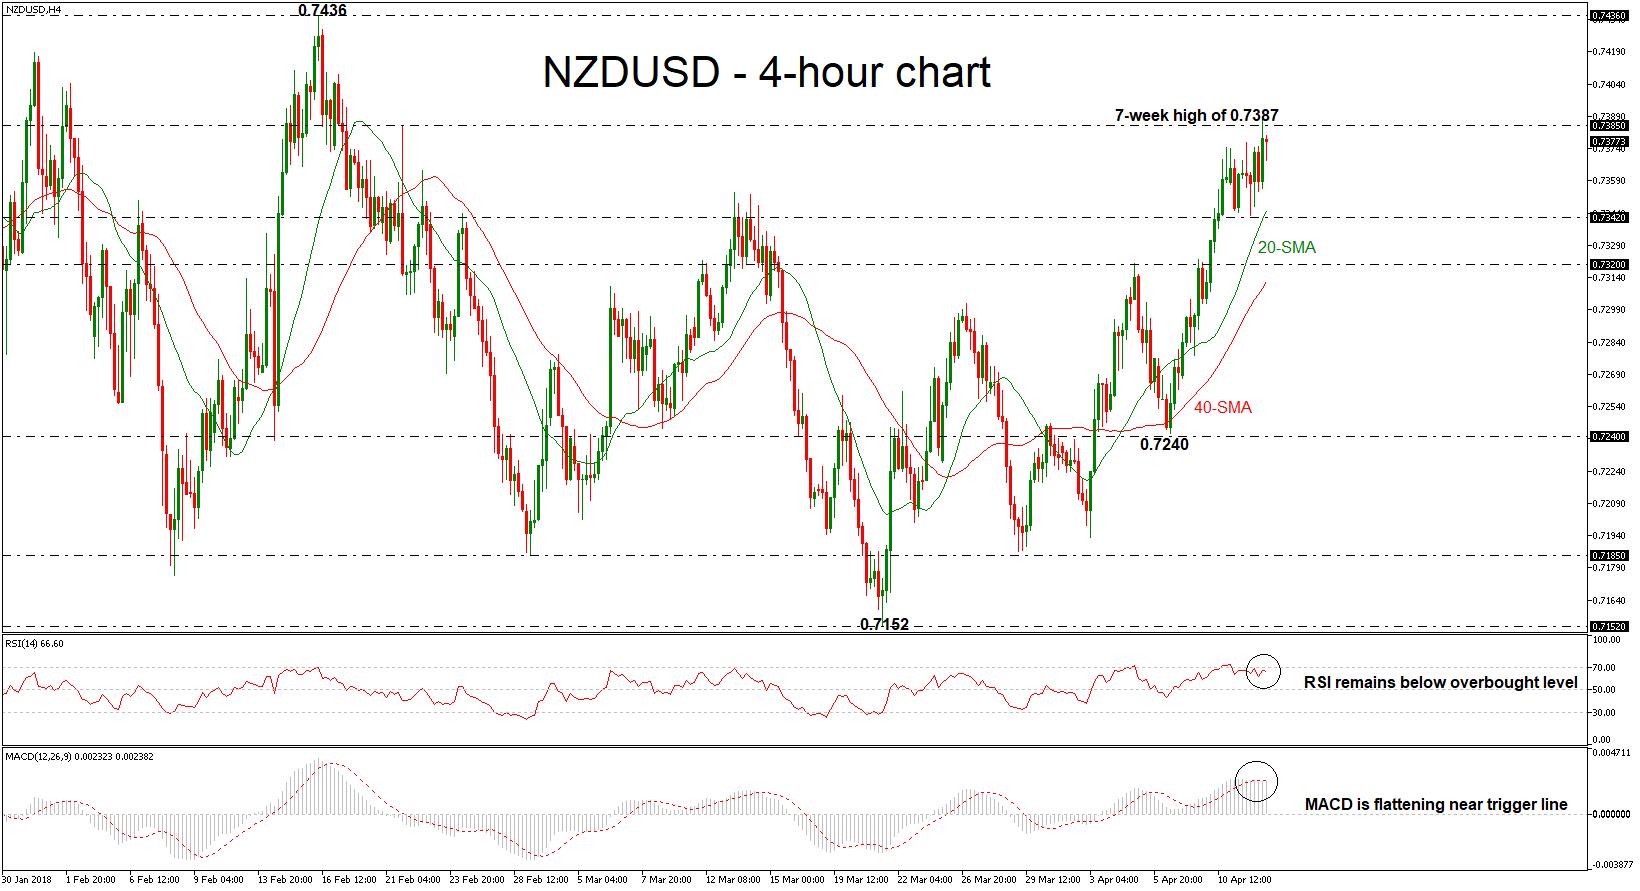 Technical Analysis – NZDUSD holds near 7-week high